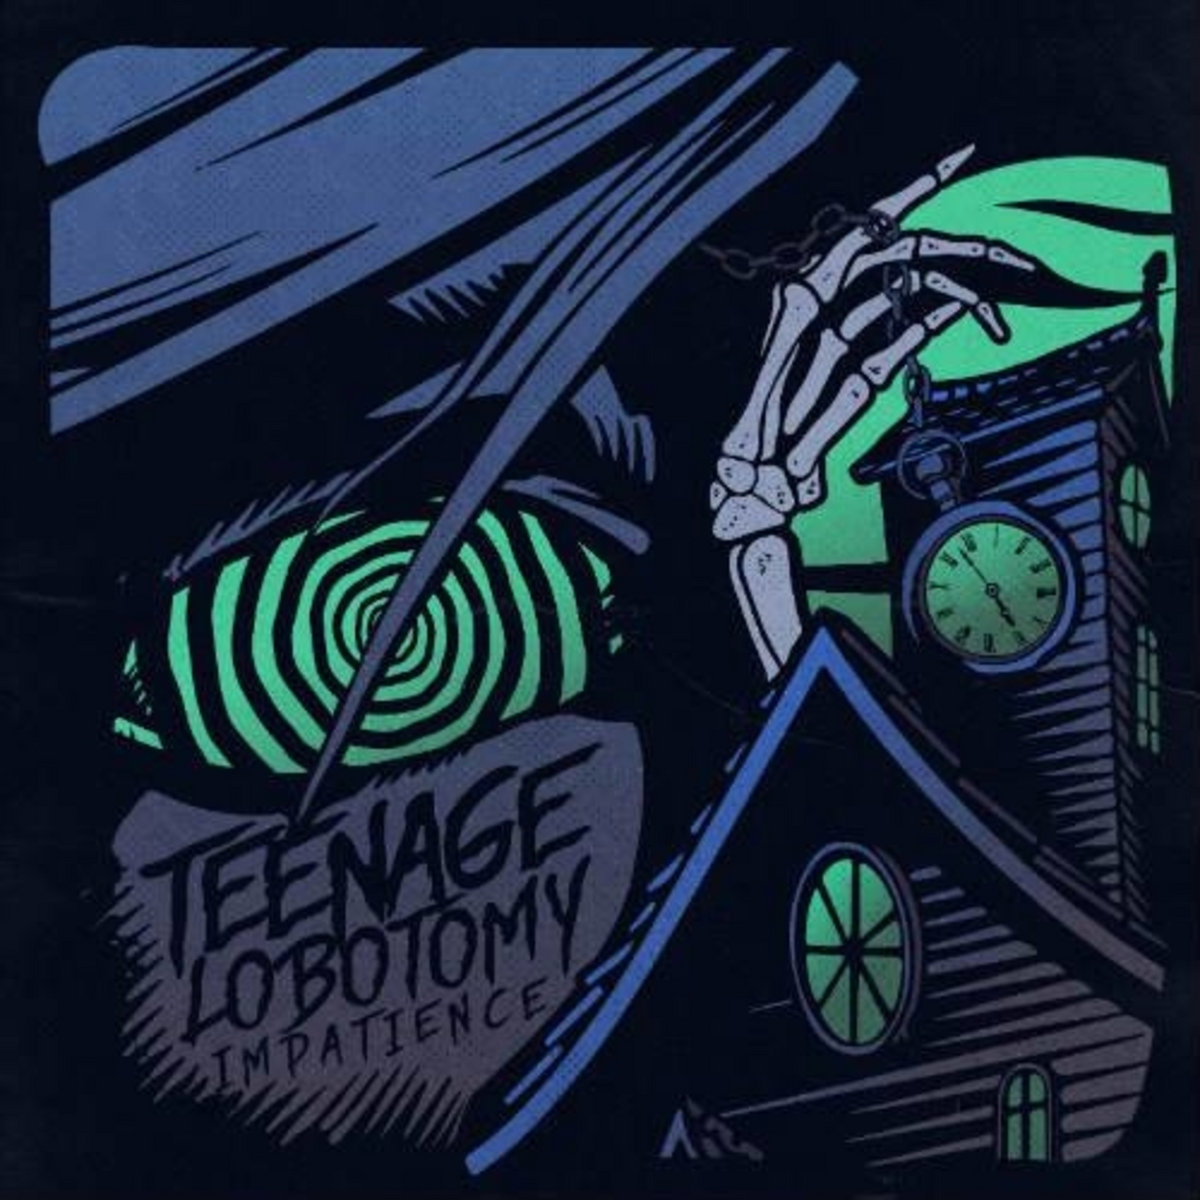 Teenage Lobotomy (FICTION FRANCAI) (French Edition)